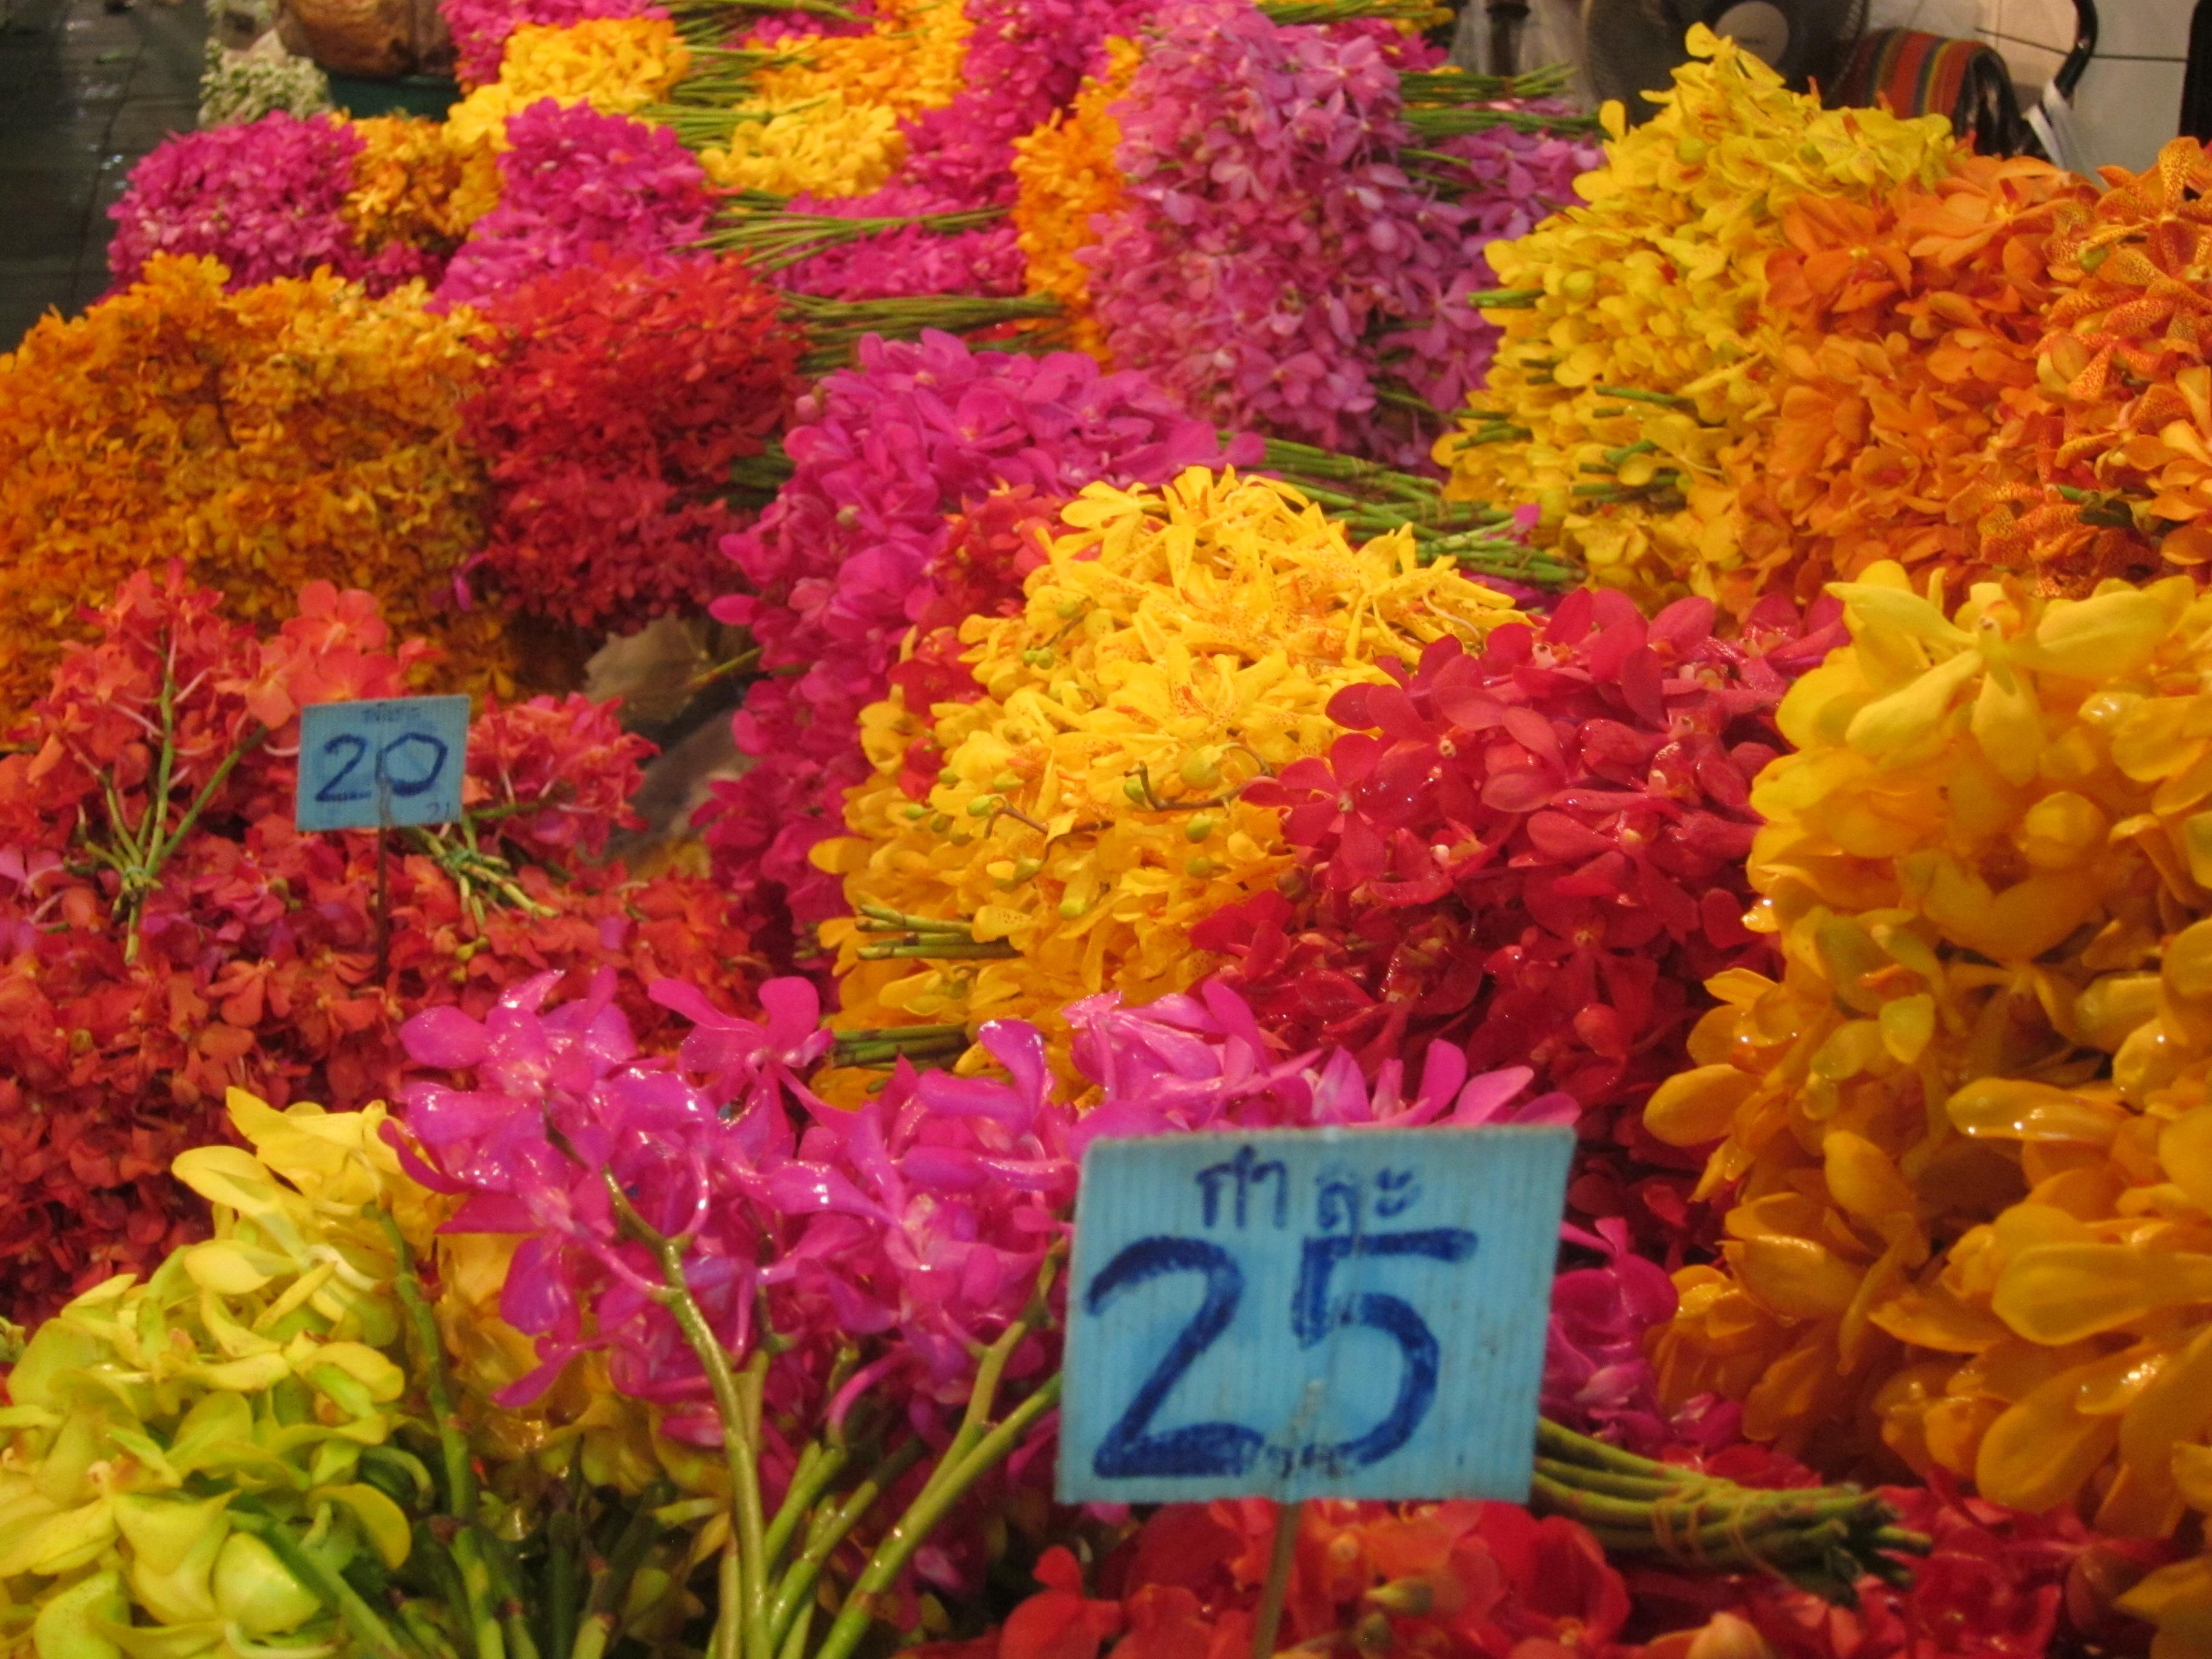 FLOWERS Night Flower Market in Bangkok Thailand